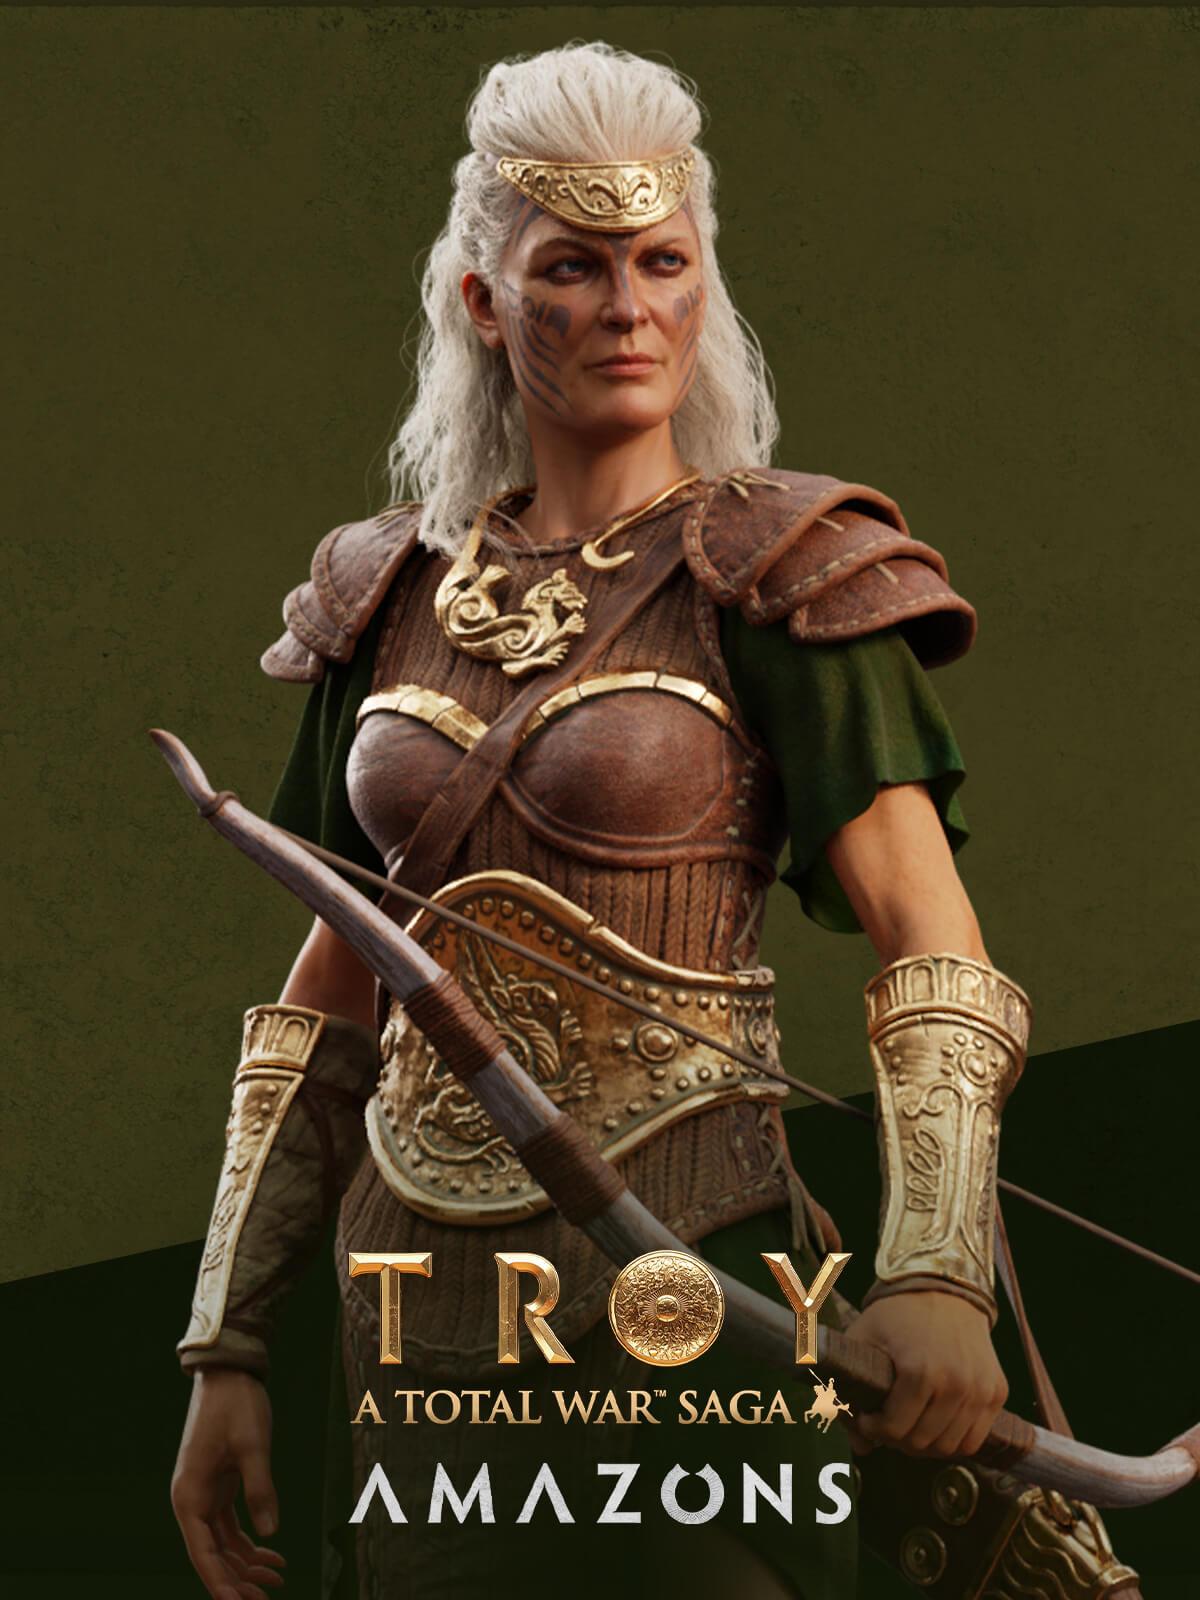 A Total War Saga Troy - Amazons DLC kostenlos im September (Epic Store)